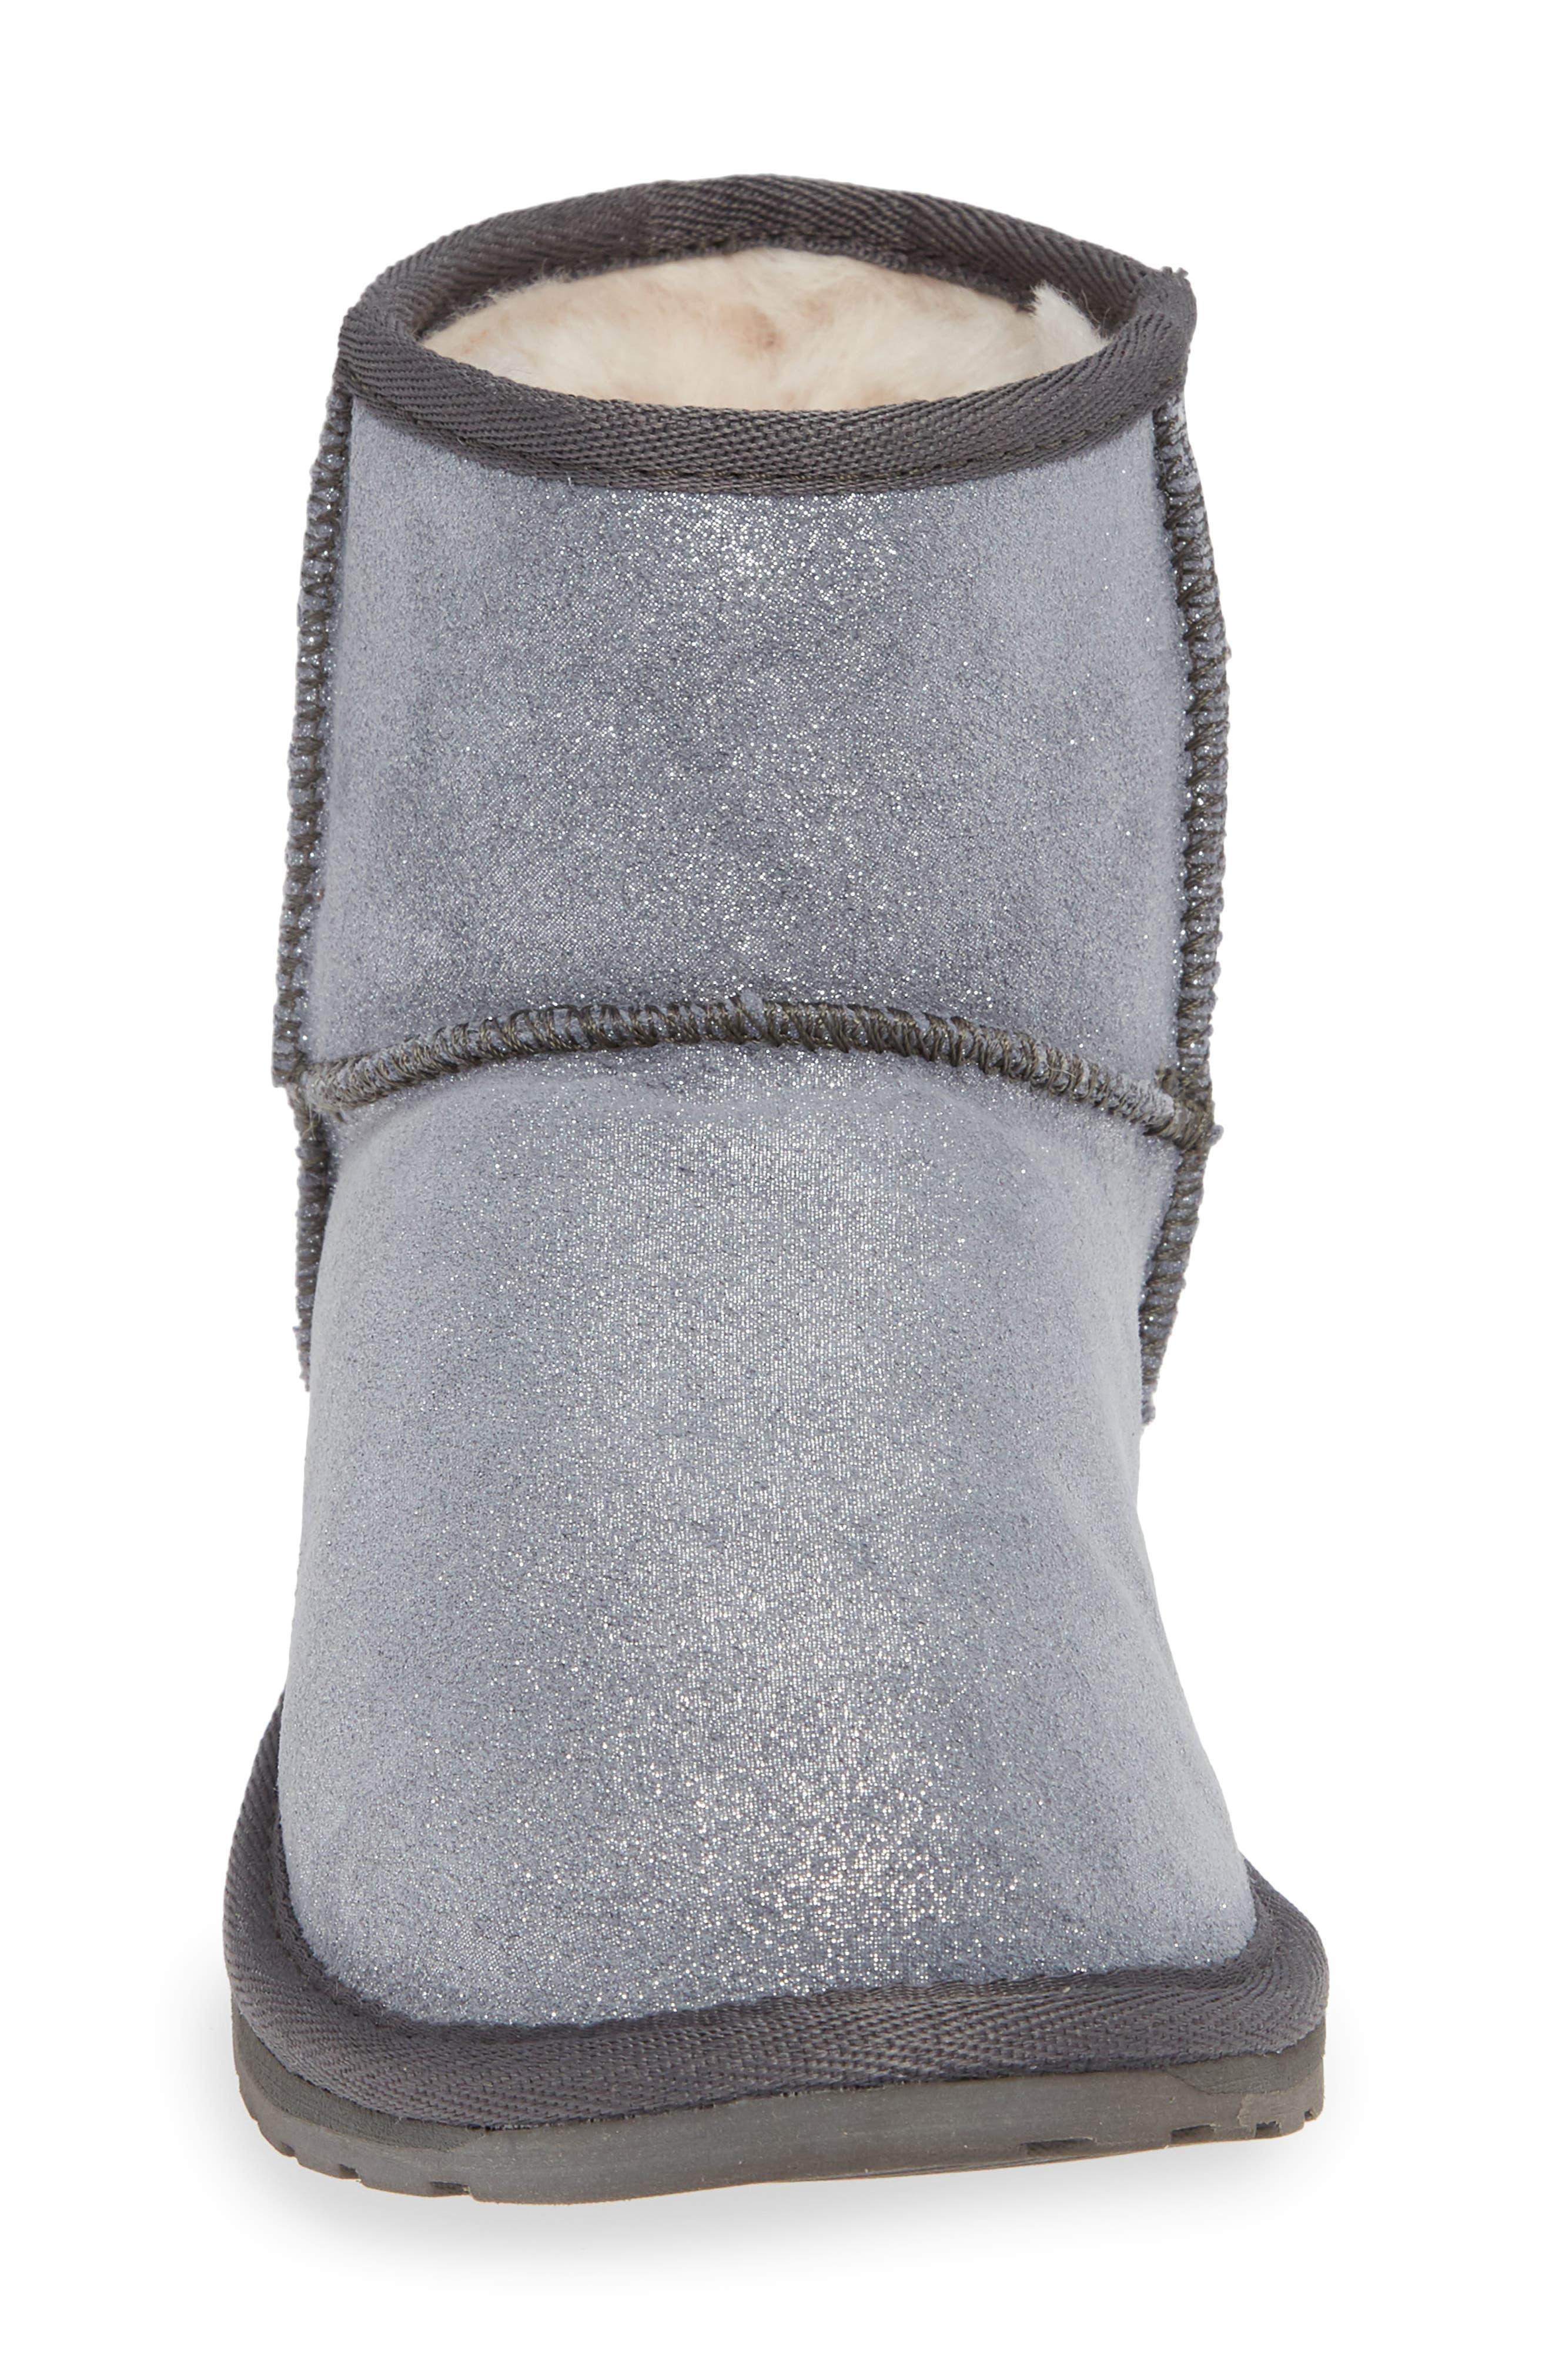 Wallaby Boot,                             Alternate thumbnail 4, color,                             METALLIC CHARCOAL